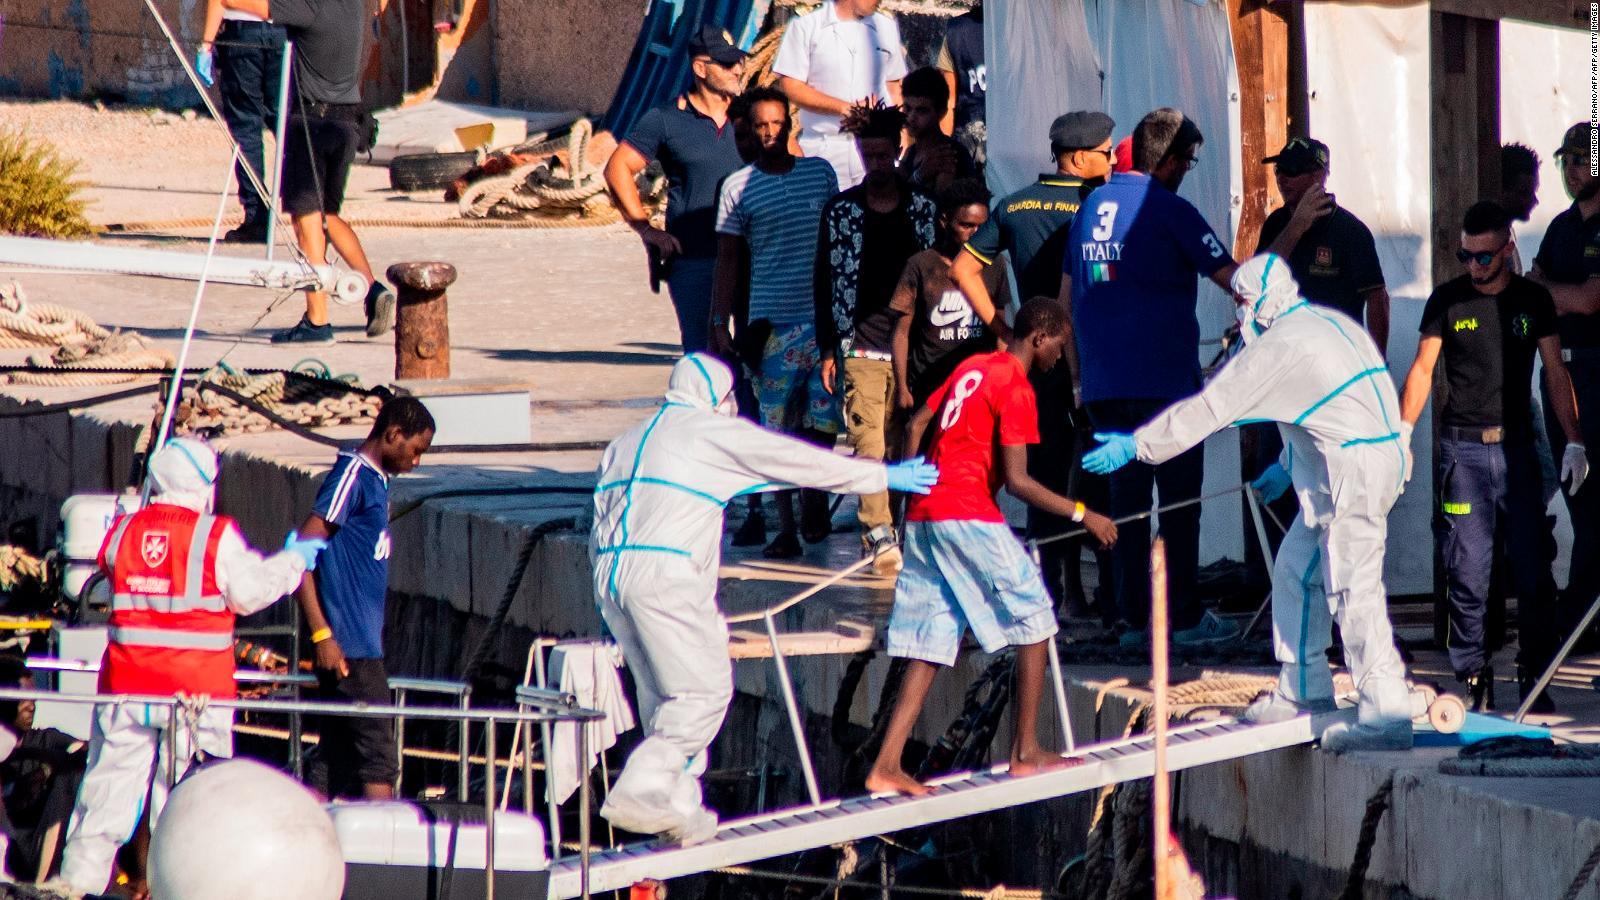 Migrantes del Open Arms fuera de control